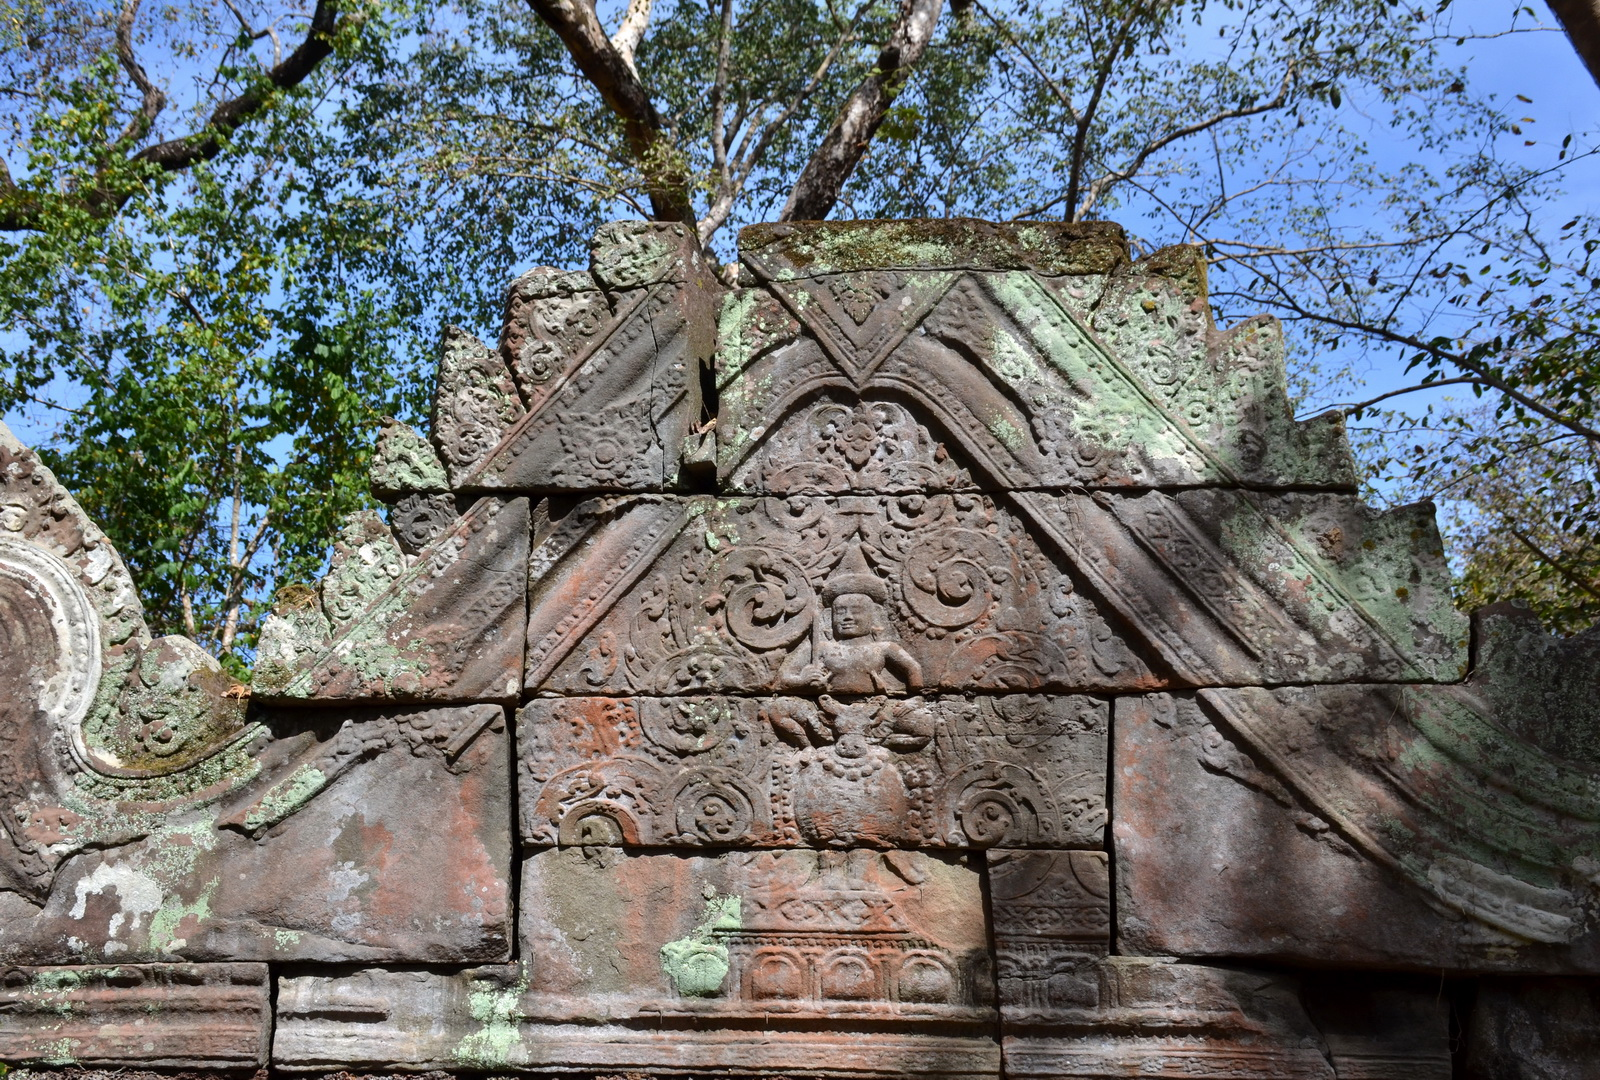 Pediment at Prasart Krachap, Koh Ker